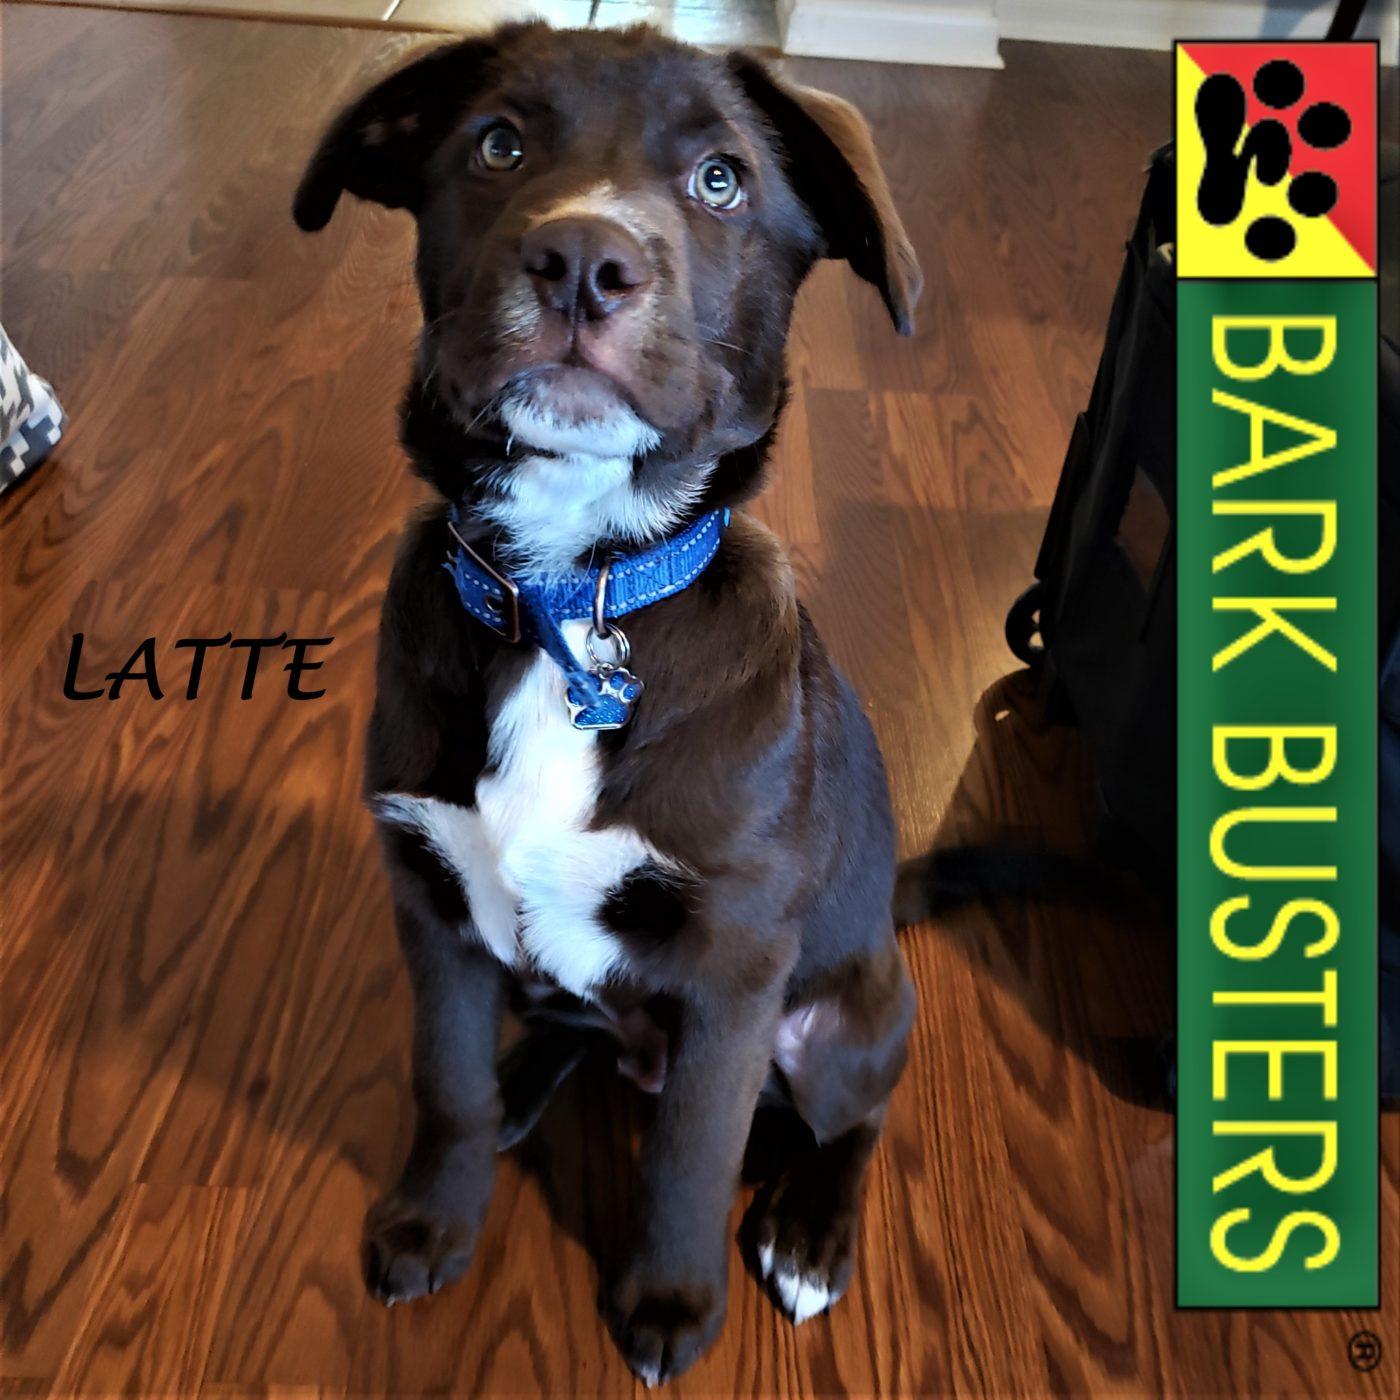 #labradorretriever #puppytraining #leashtraining #obediencetraining #dogtrainingaustin #dogtrainernearme #barkbusters #atx #inhomedogtraining